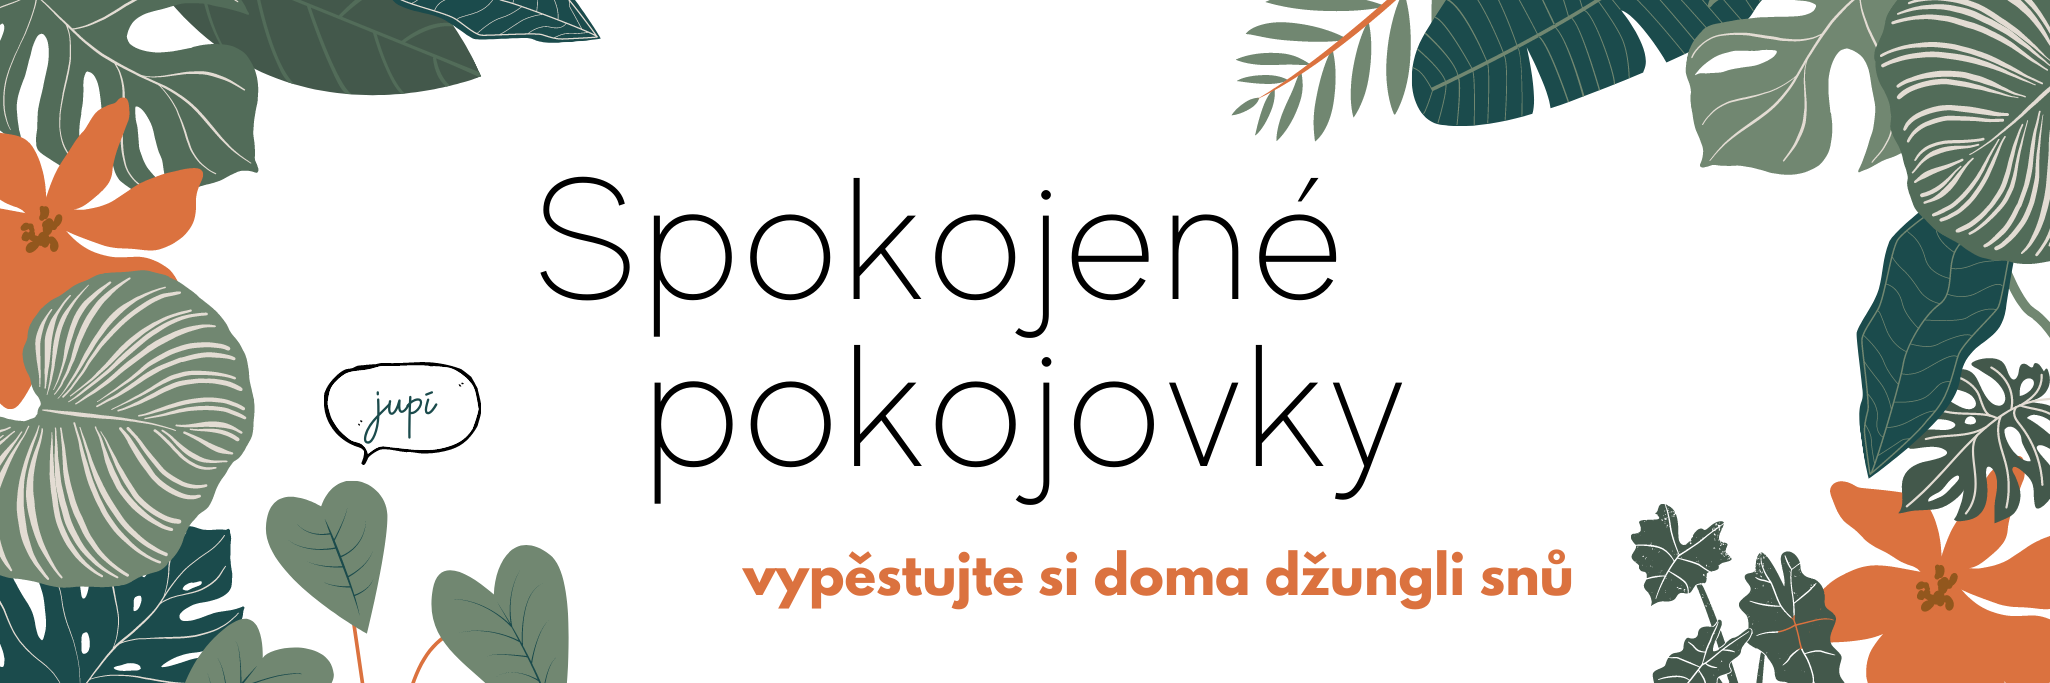 Spokojenepokojovky.cz | Iris Marešová